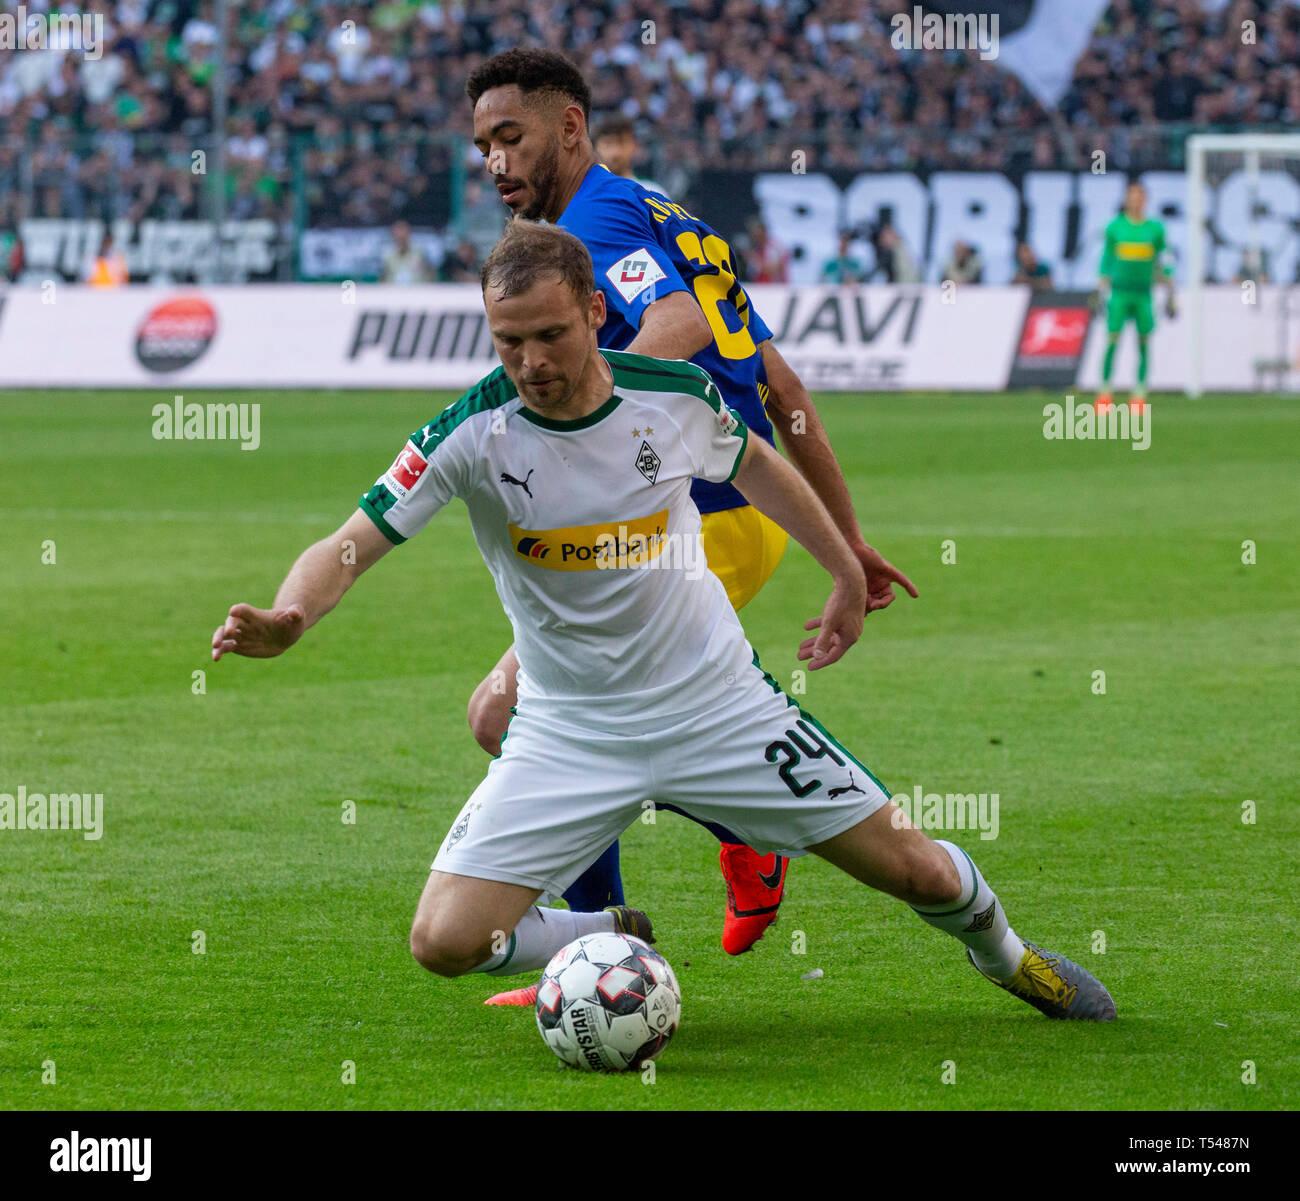 sports, football, Bundesliga, 2018/2019, Borussia Moenchengladbach vs RB Leipzig 1-2, Stadium Borussia Park, scene of the match, Tony Jantschke (MG) ahead, behind Matheus Cunha (RBL), DFL REGULATIONS PROHIBIT ANY USE OF PHOTOGRAPHS AS IMAGE SEQUENCES AND/OR QUASI-VIDEO - Stock Image